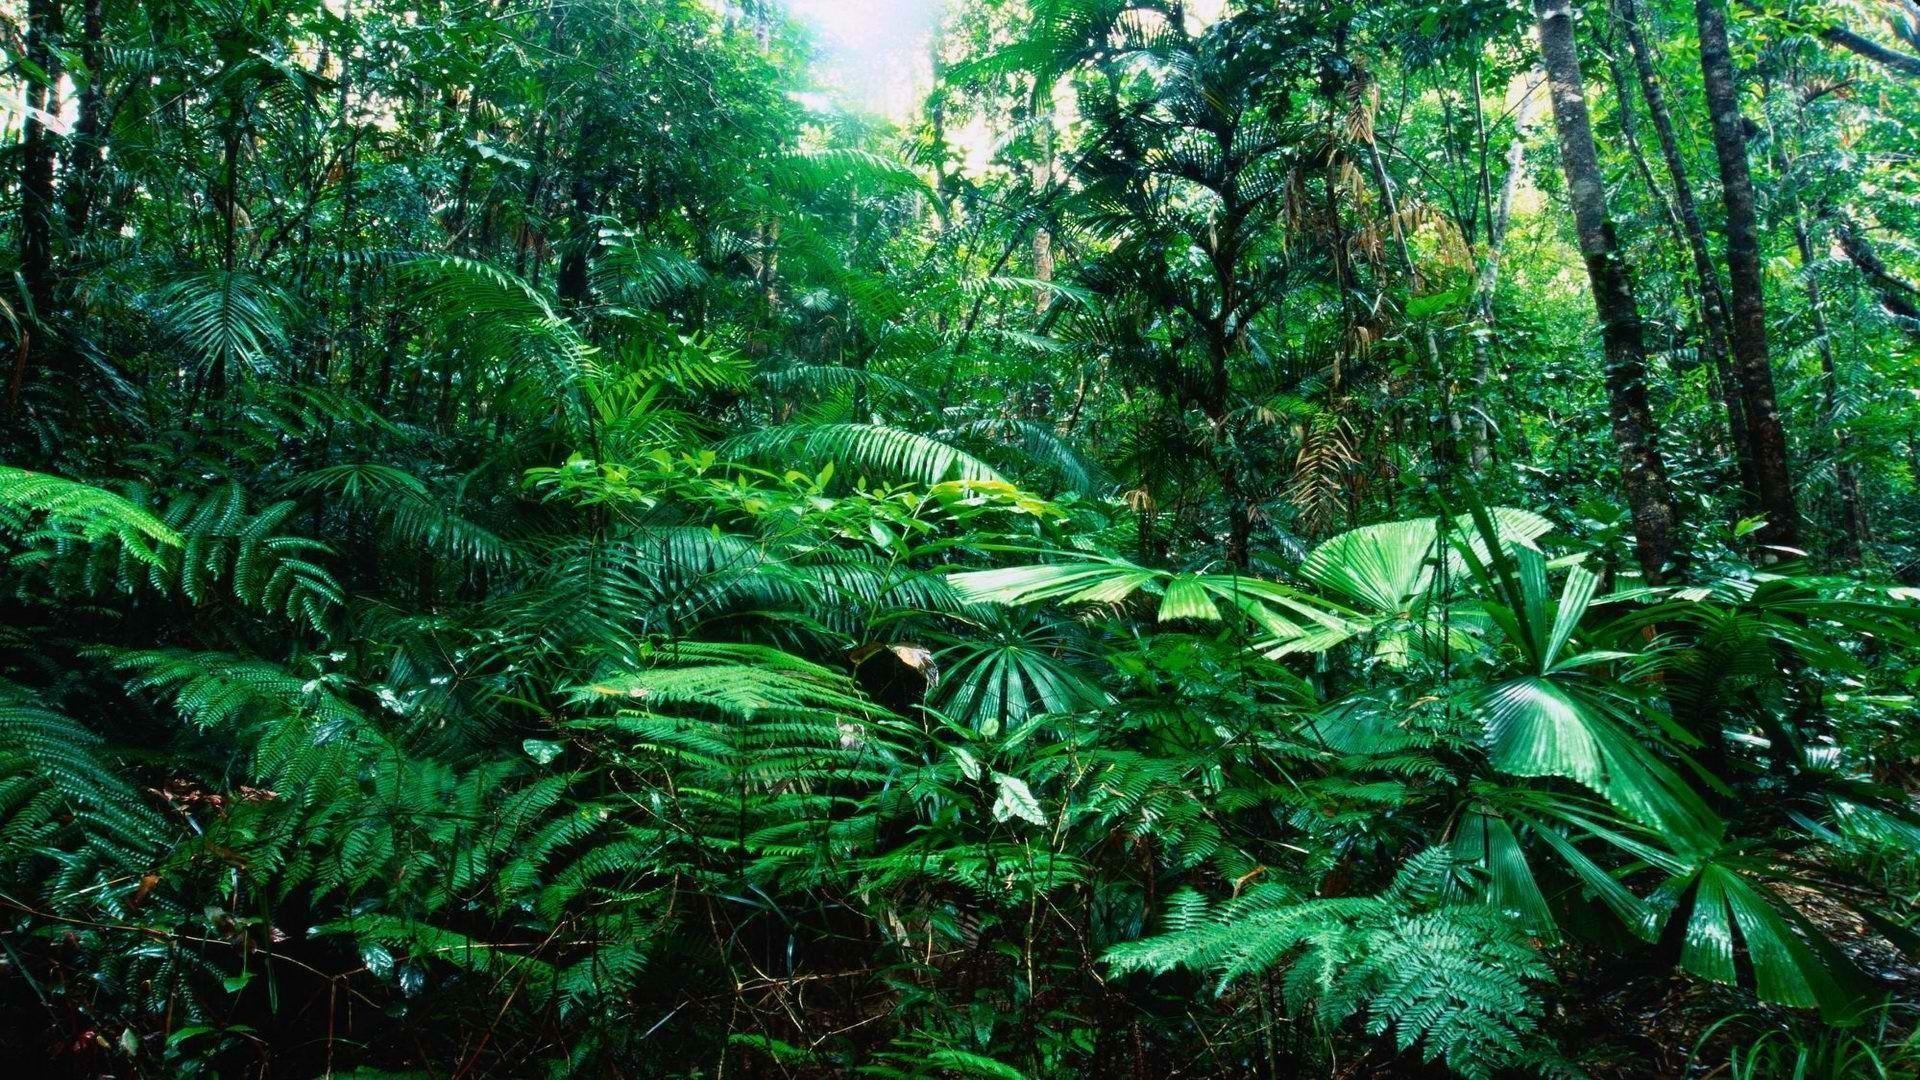 Rainforest Wallpaper (61+ images)